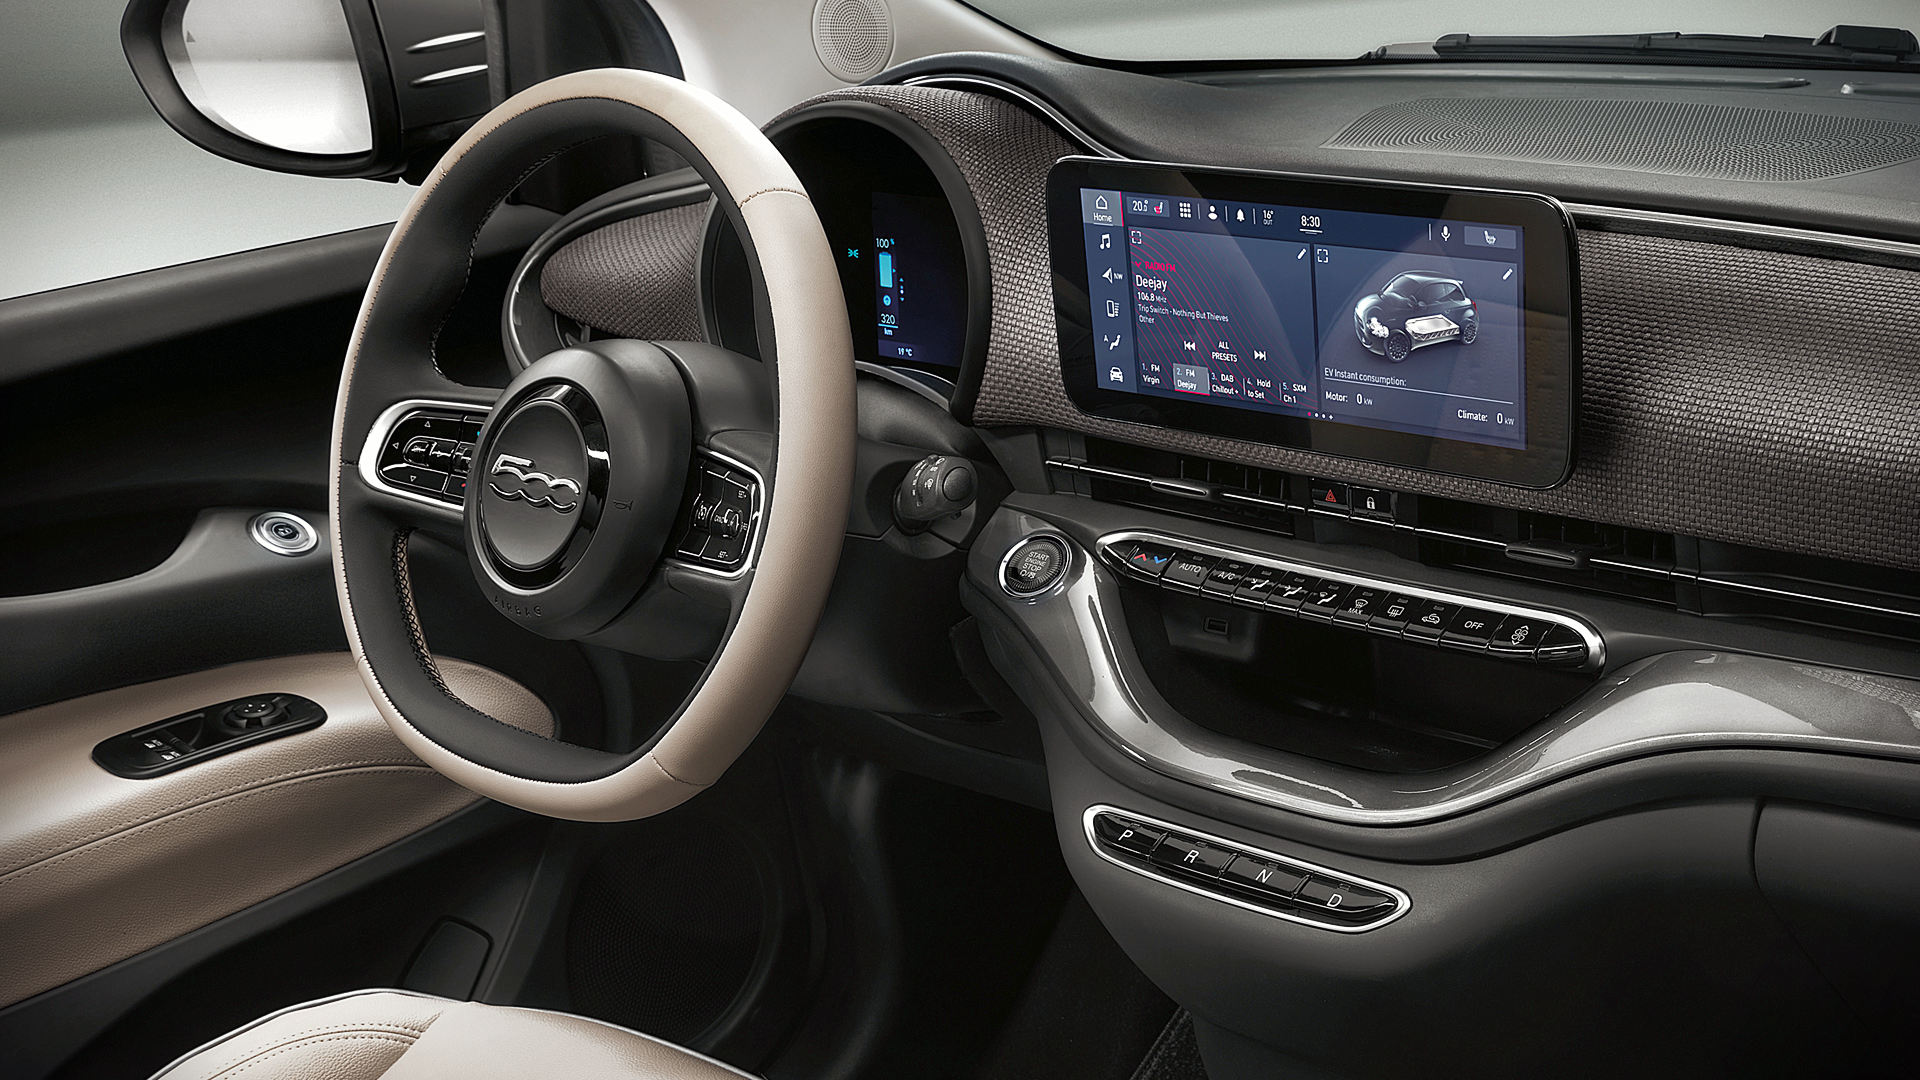 Fiat 500 2021 Interior Wallpaper